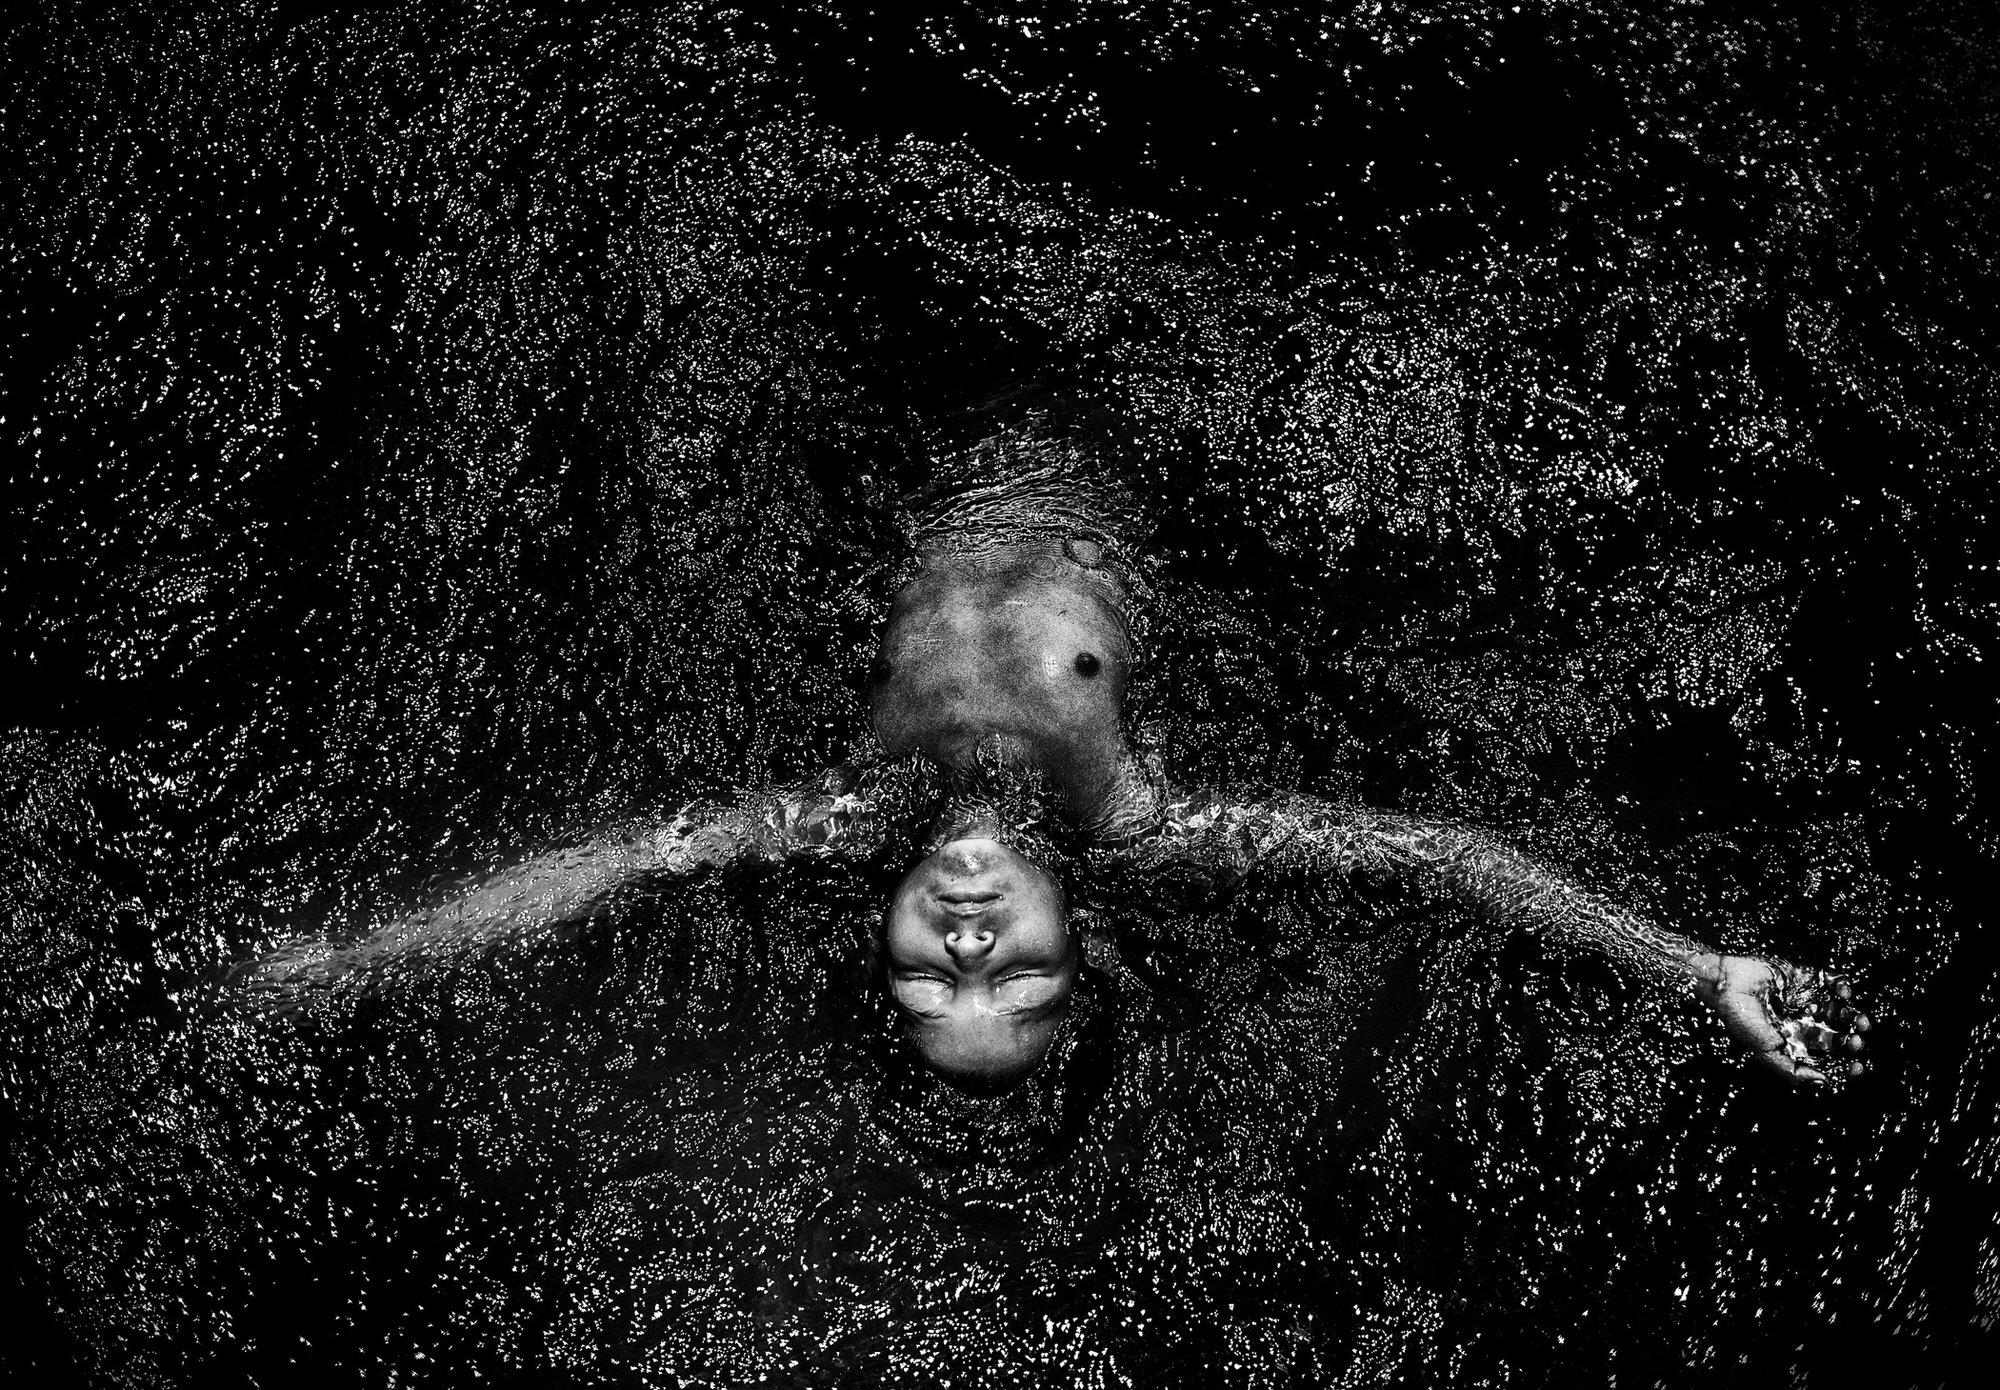 Javier Arcenillas的黑白摄影